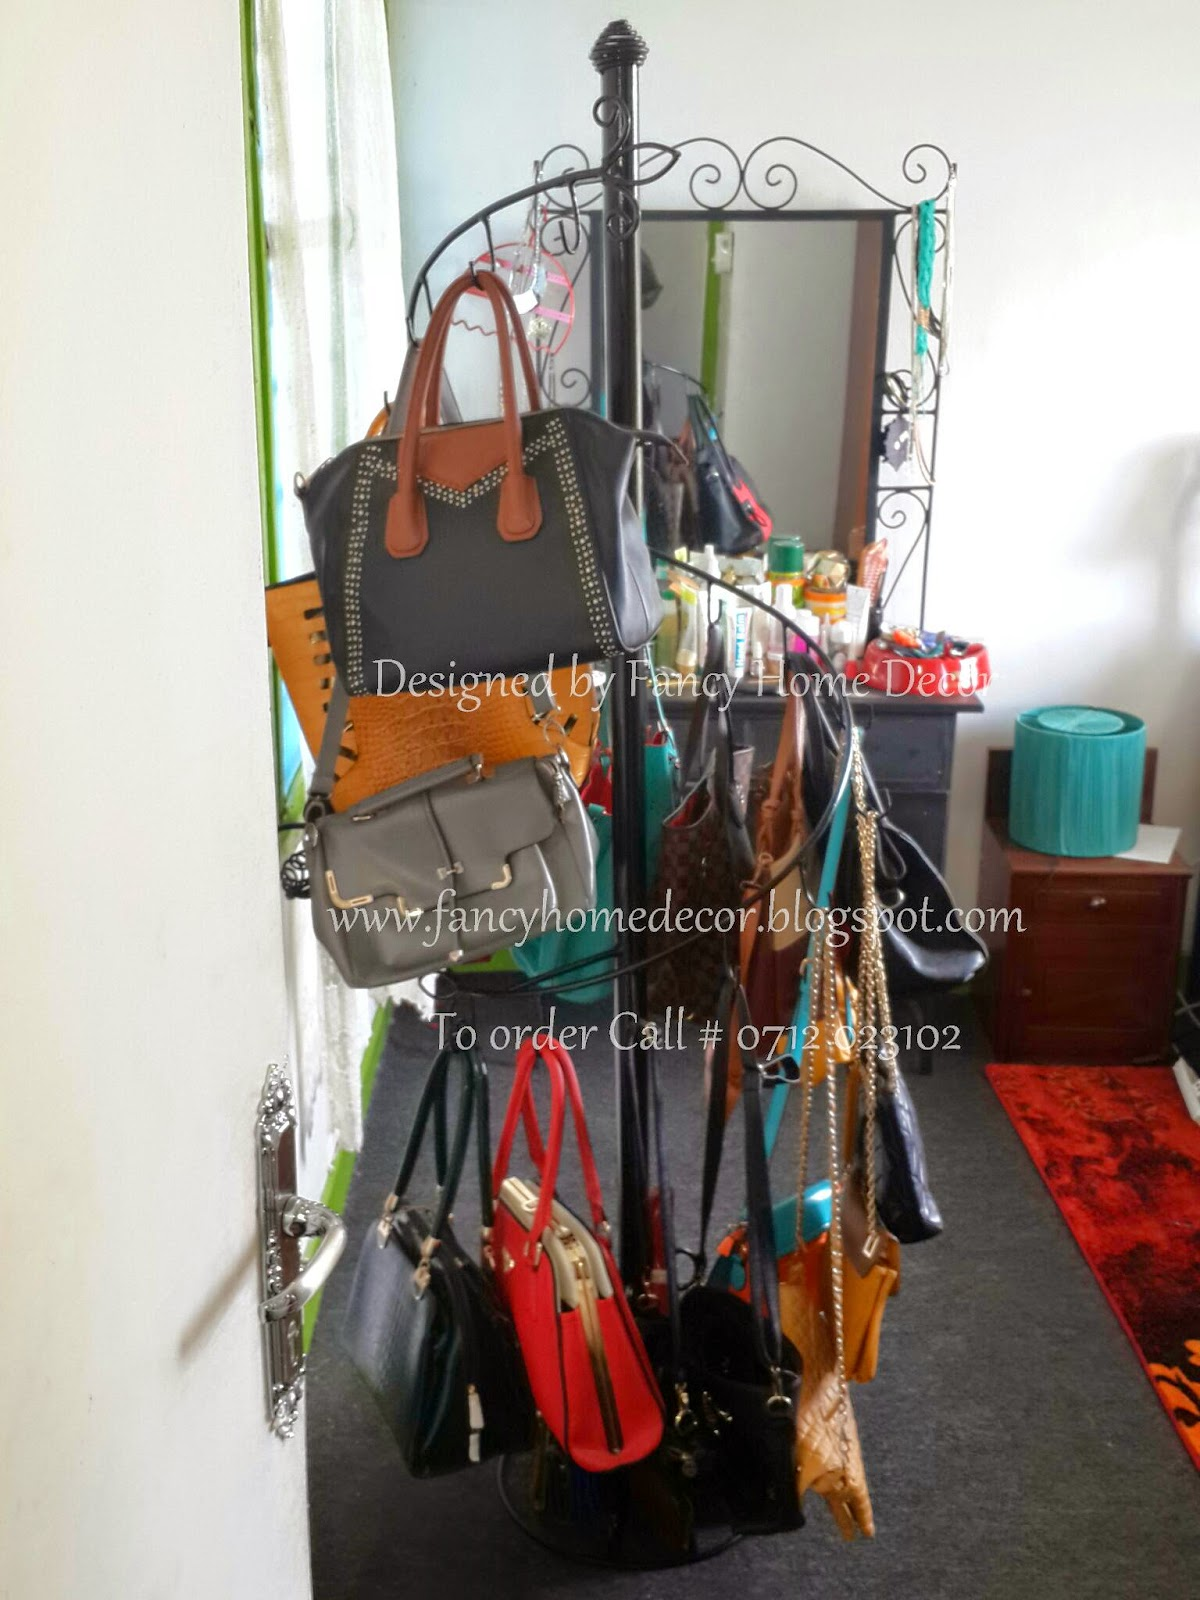 Stylish Kitchen Cabinets Fancy Home Decor My Project Shoe Rack Handbag Stand